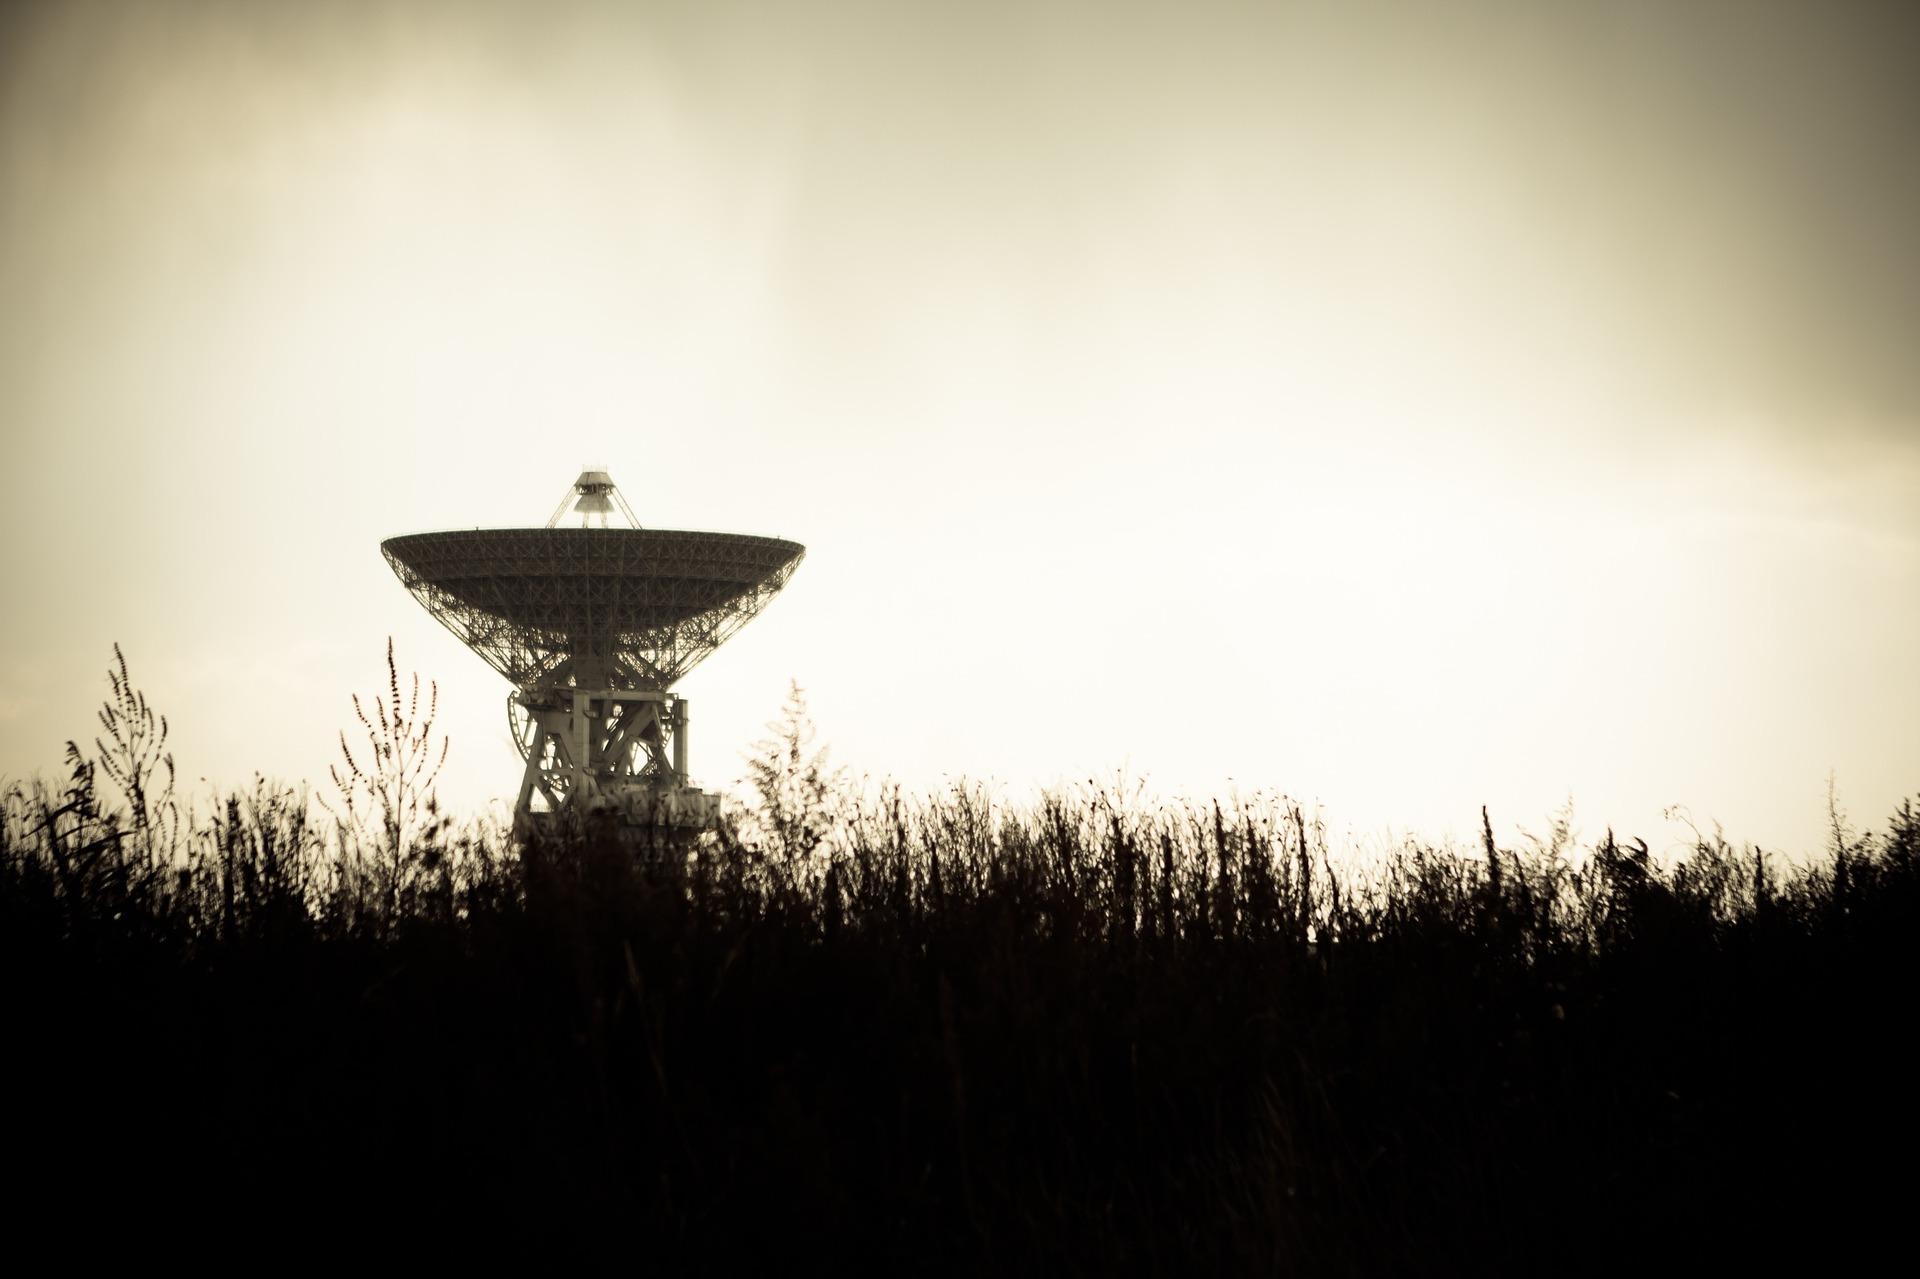 telescopio radiofonico, Astronomia, antenna, Osservatorio, Ricerca, comunicazione, Astrofisica, antenna parabolica - Sfondi HD - Professor-falken.com